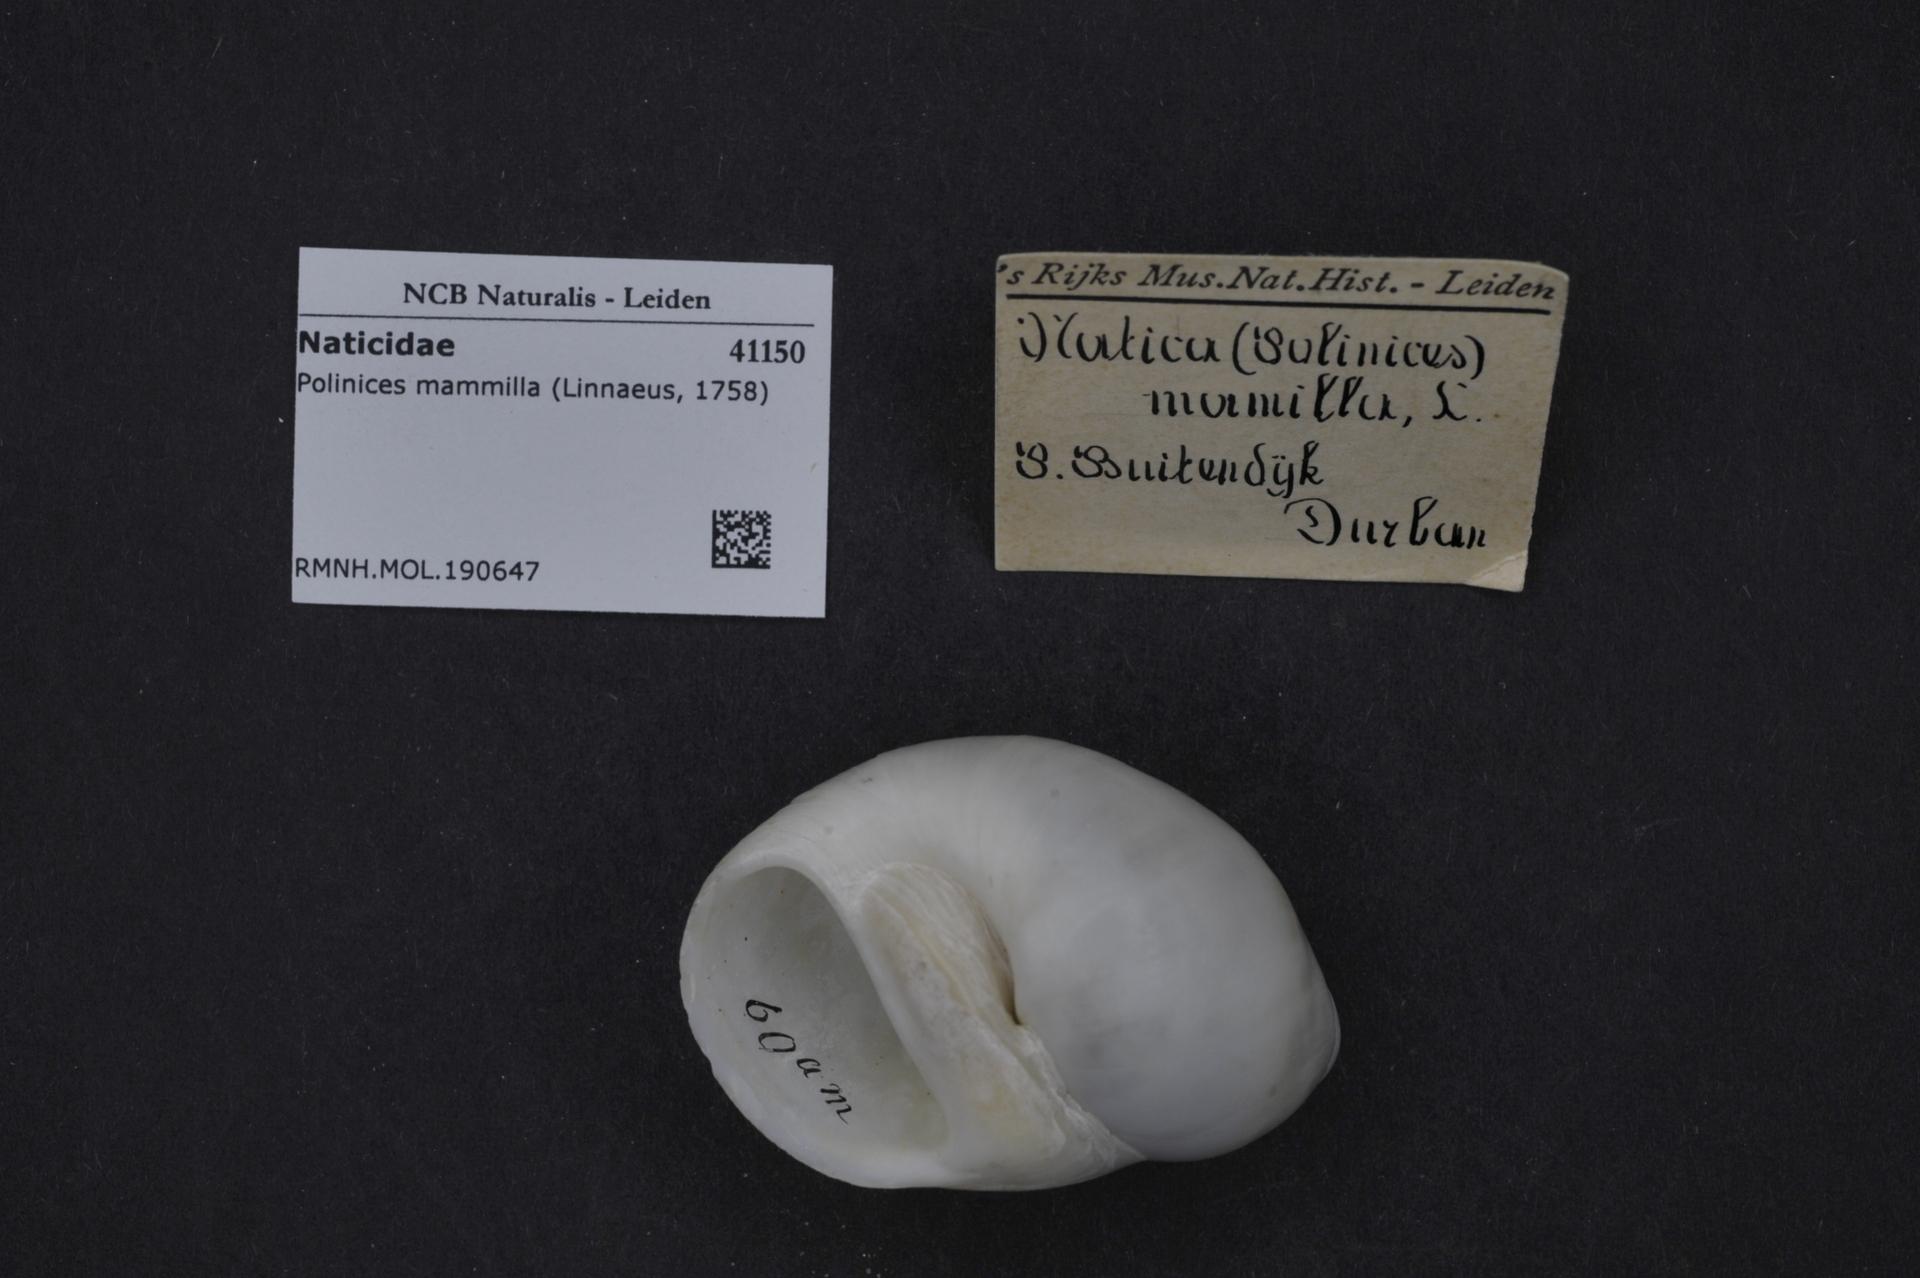 RMNH.MOL.190647 | Polinices mammilla (Linnaeus, 1758)